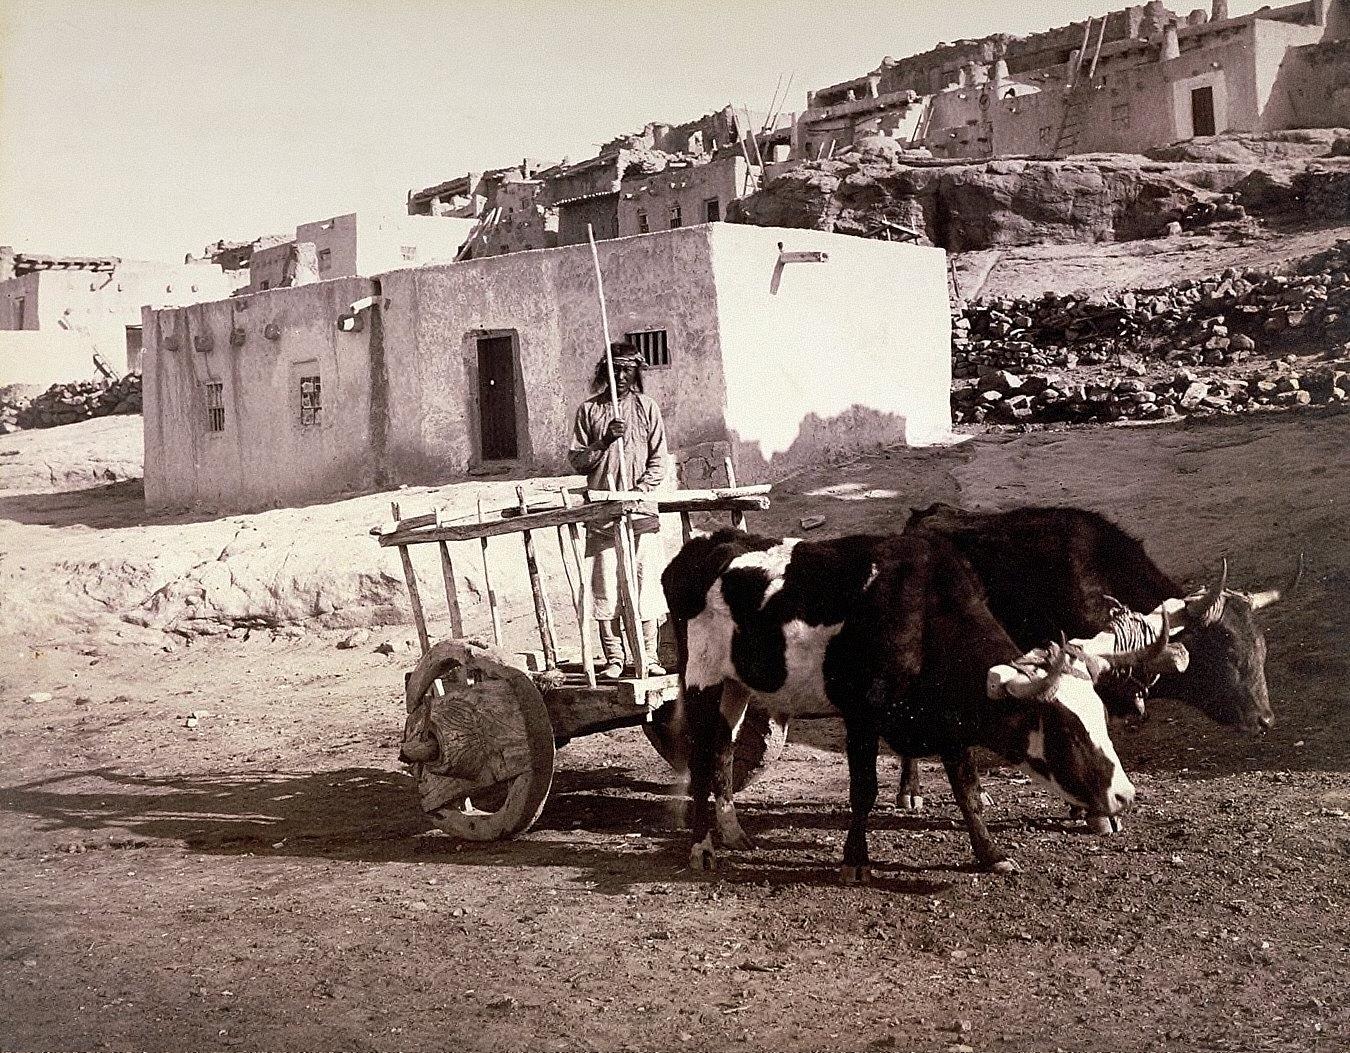 The Old Carreta, Laguna, New Mexico